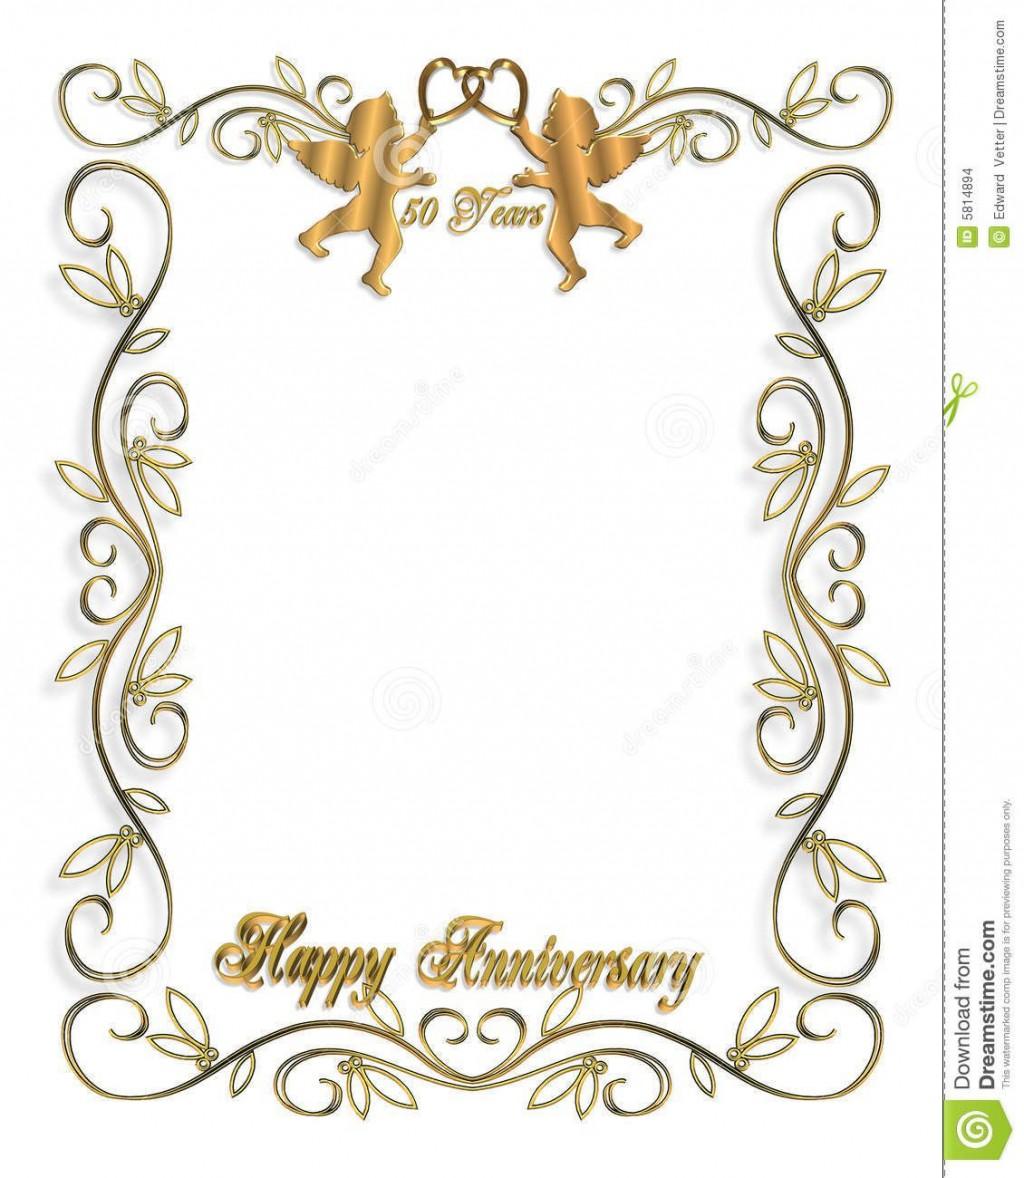 010 Unbelievable 50th Anniversary Invitation Template High Resolution  Wedding Microsoft Word Free DownloadLarge